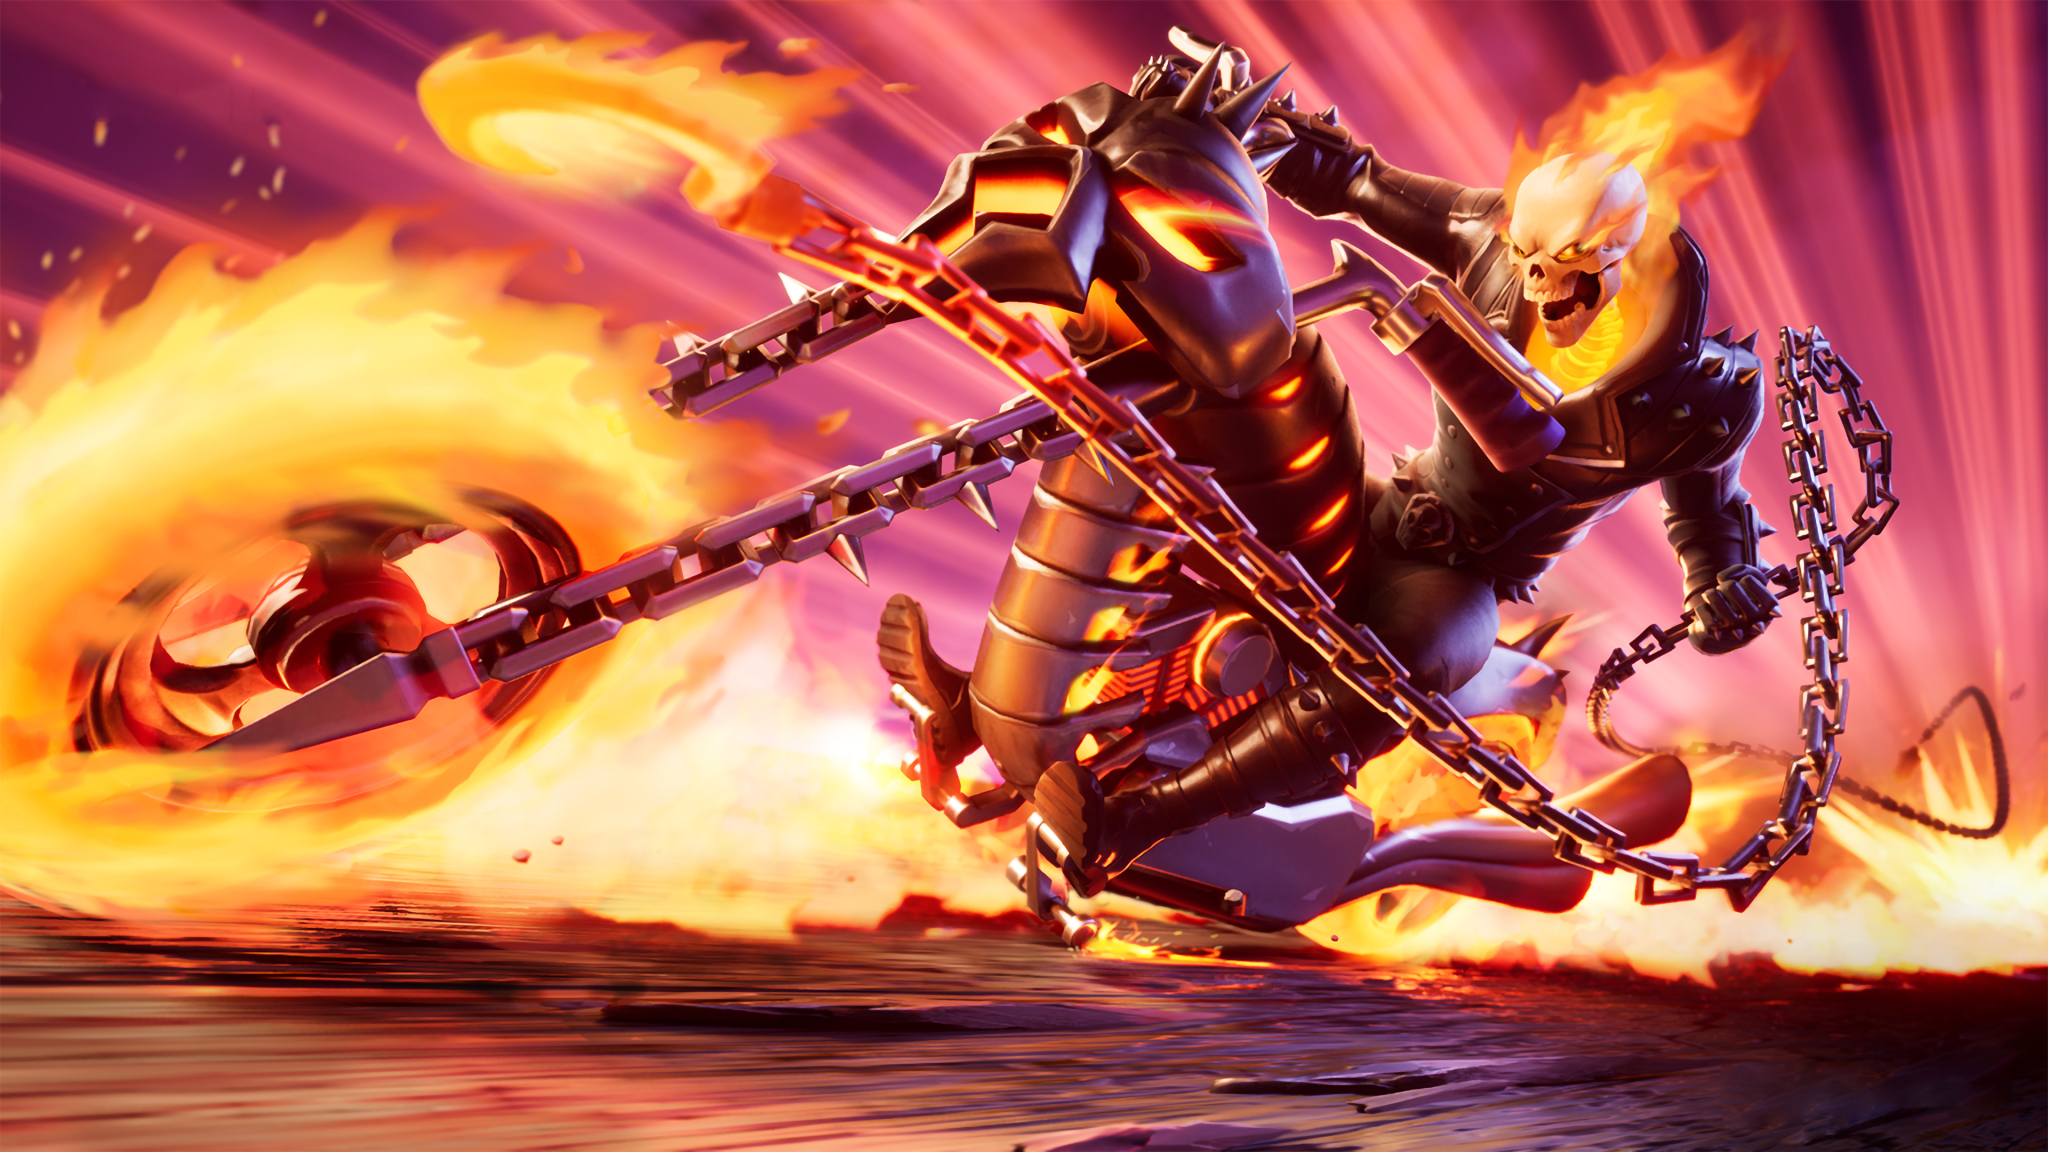 2048x1152 Ghost Rider 4K Fortnite 2048x1152 Resolution ...